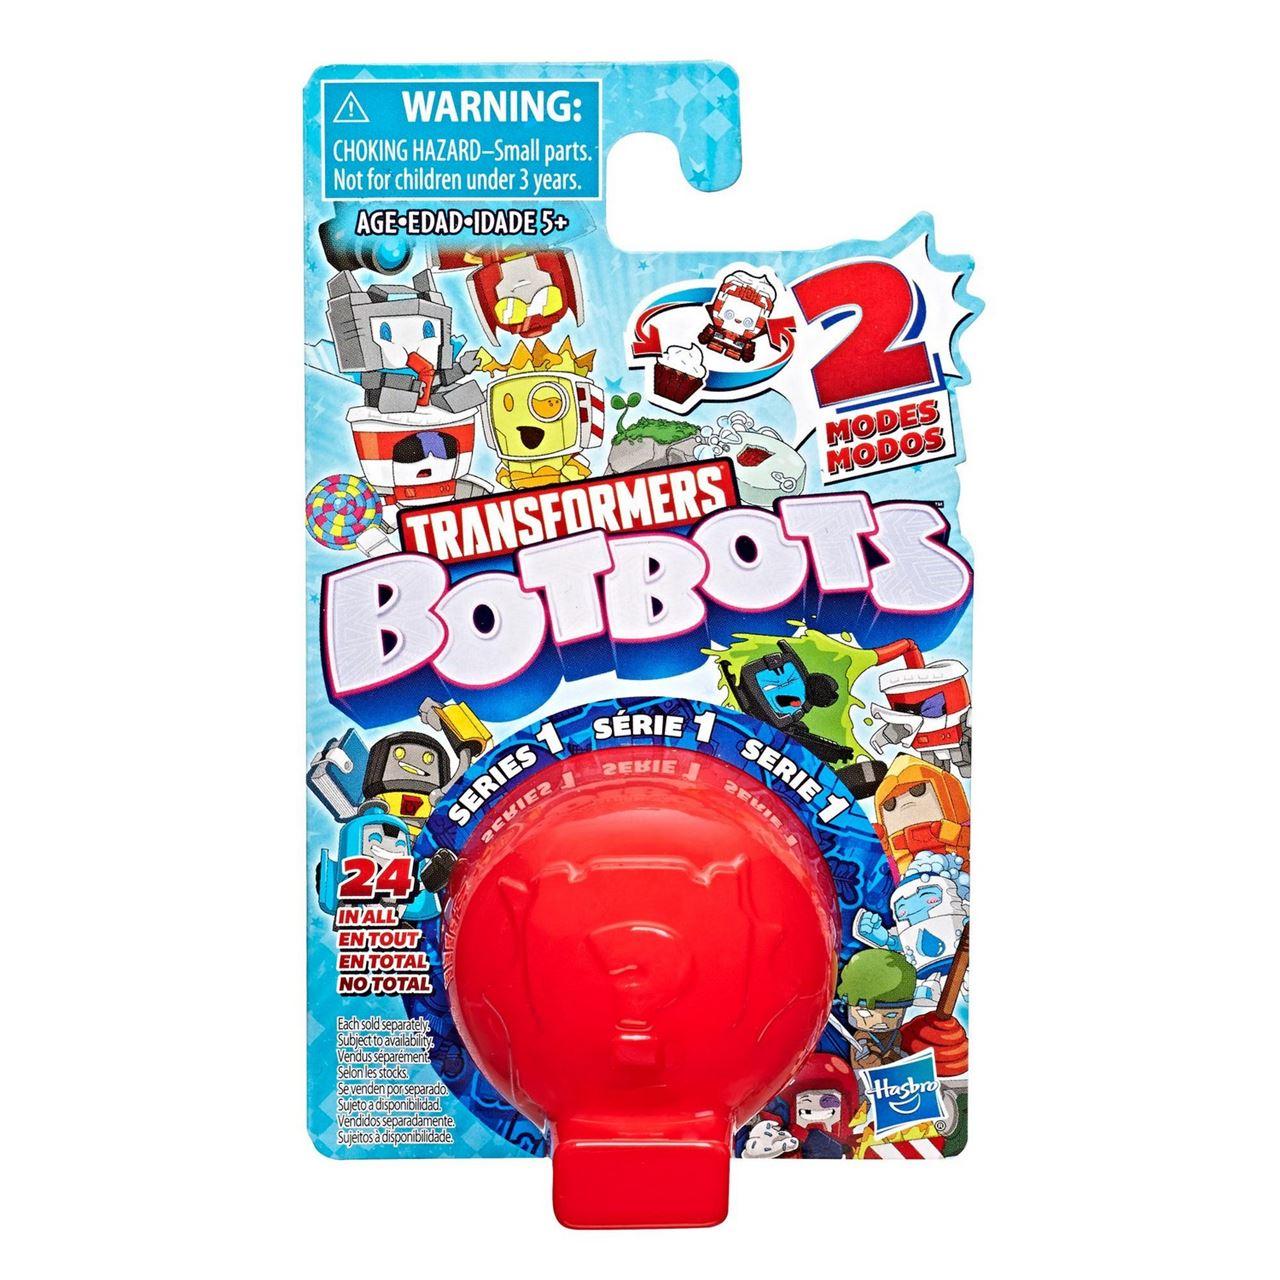 Transformers BotBots Point Dexter Complete